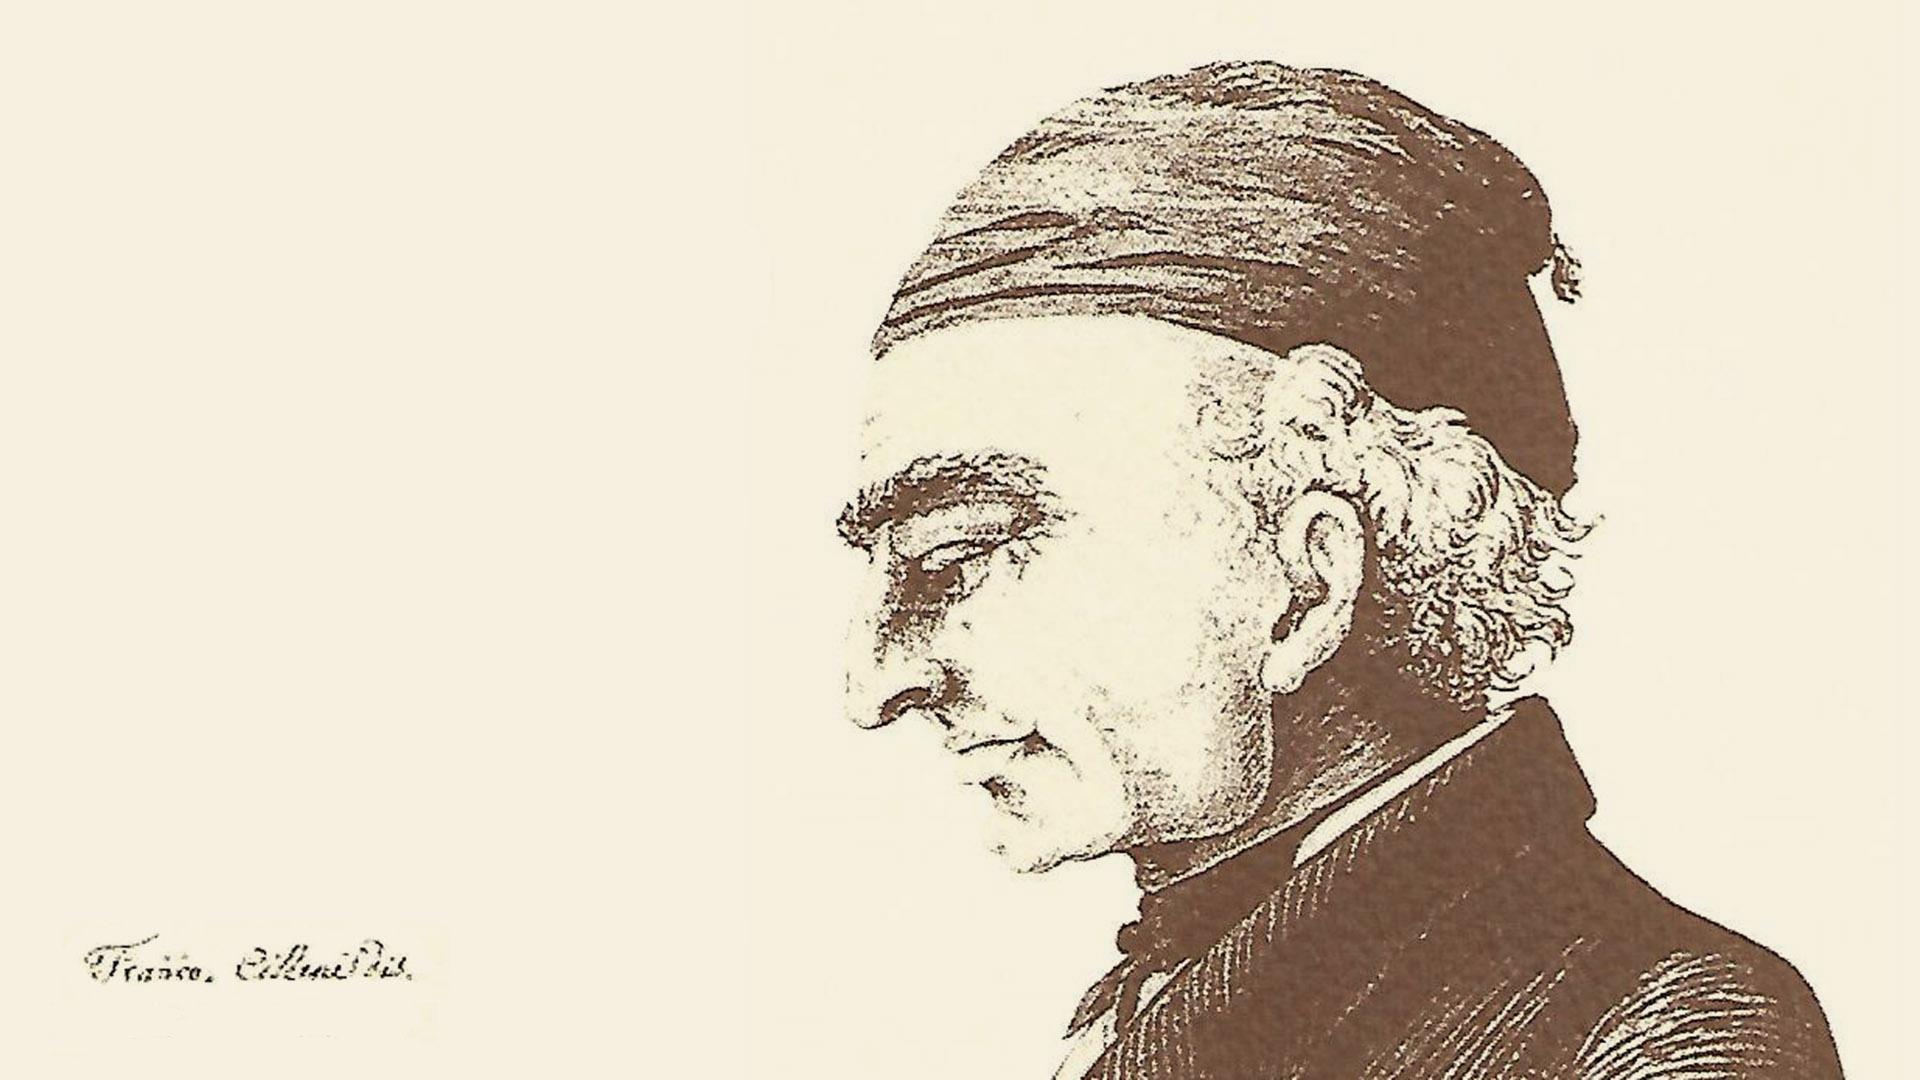 Frondini Francesco Antonio